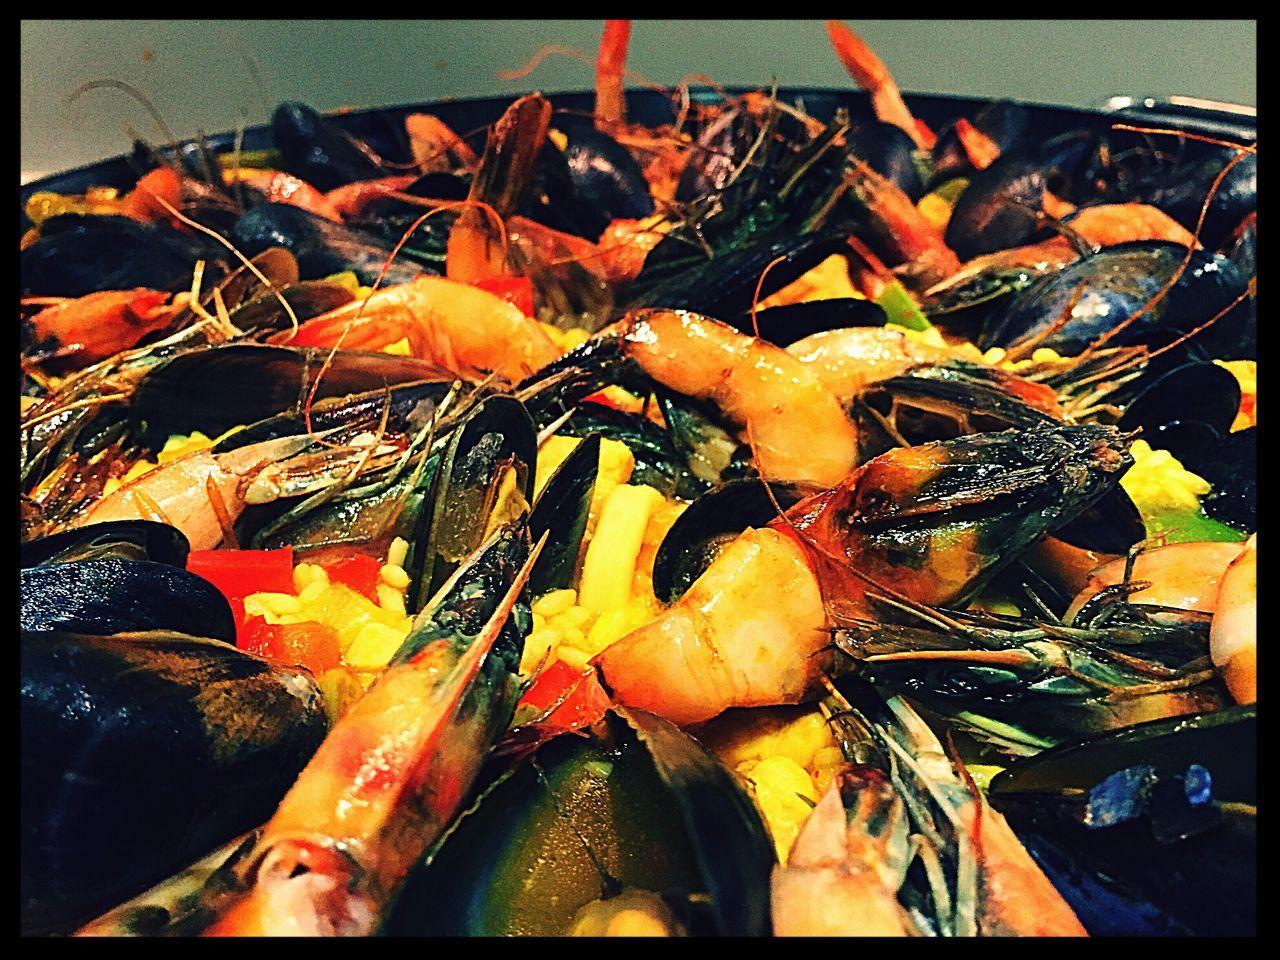 Food Preparation Paiella Seafood Freshness Cooking